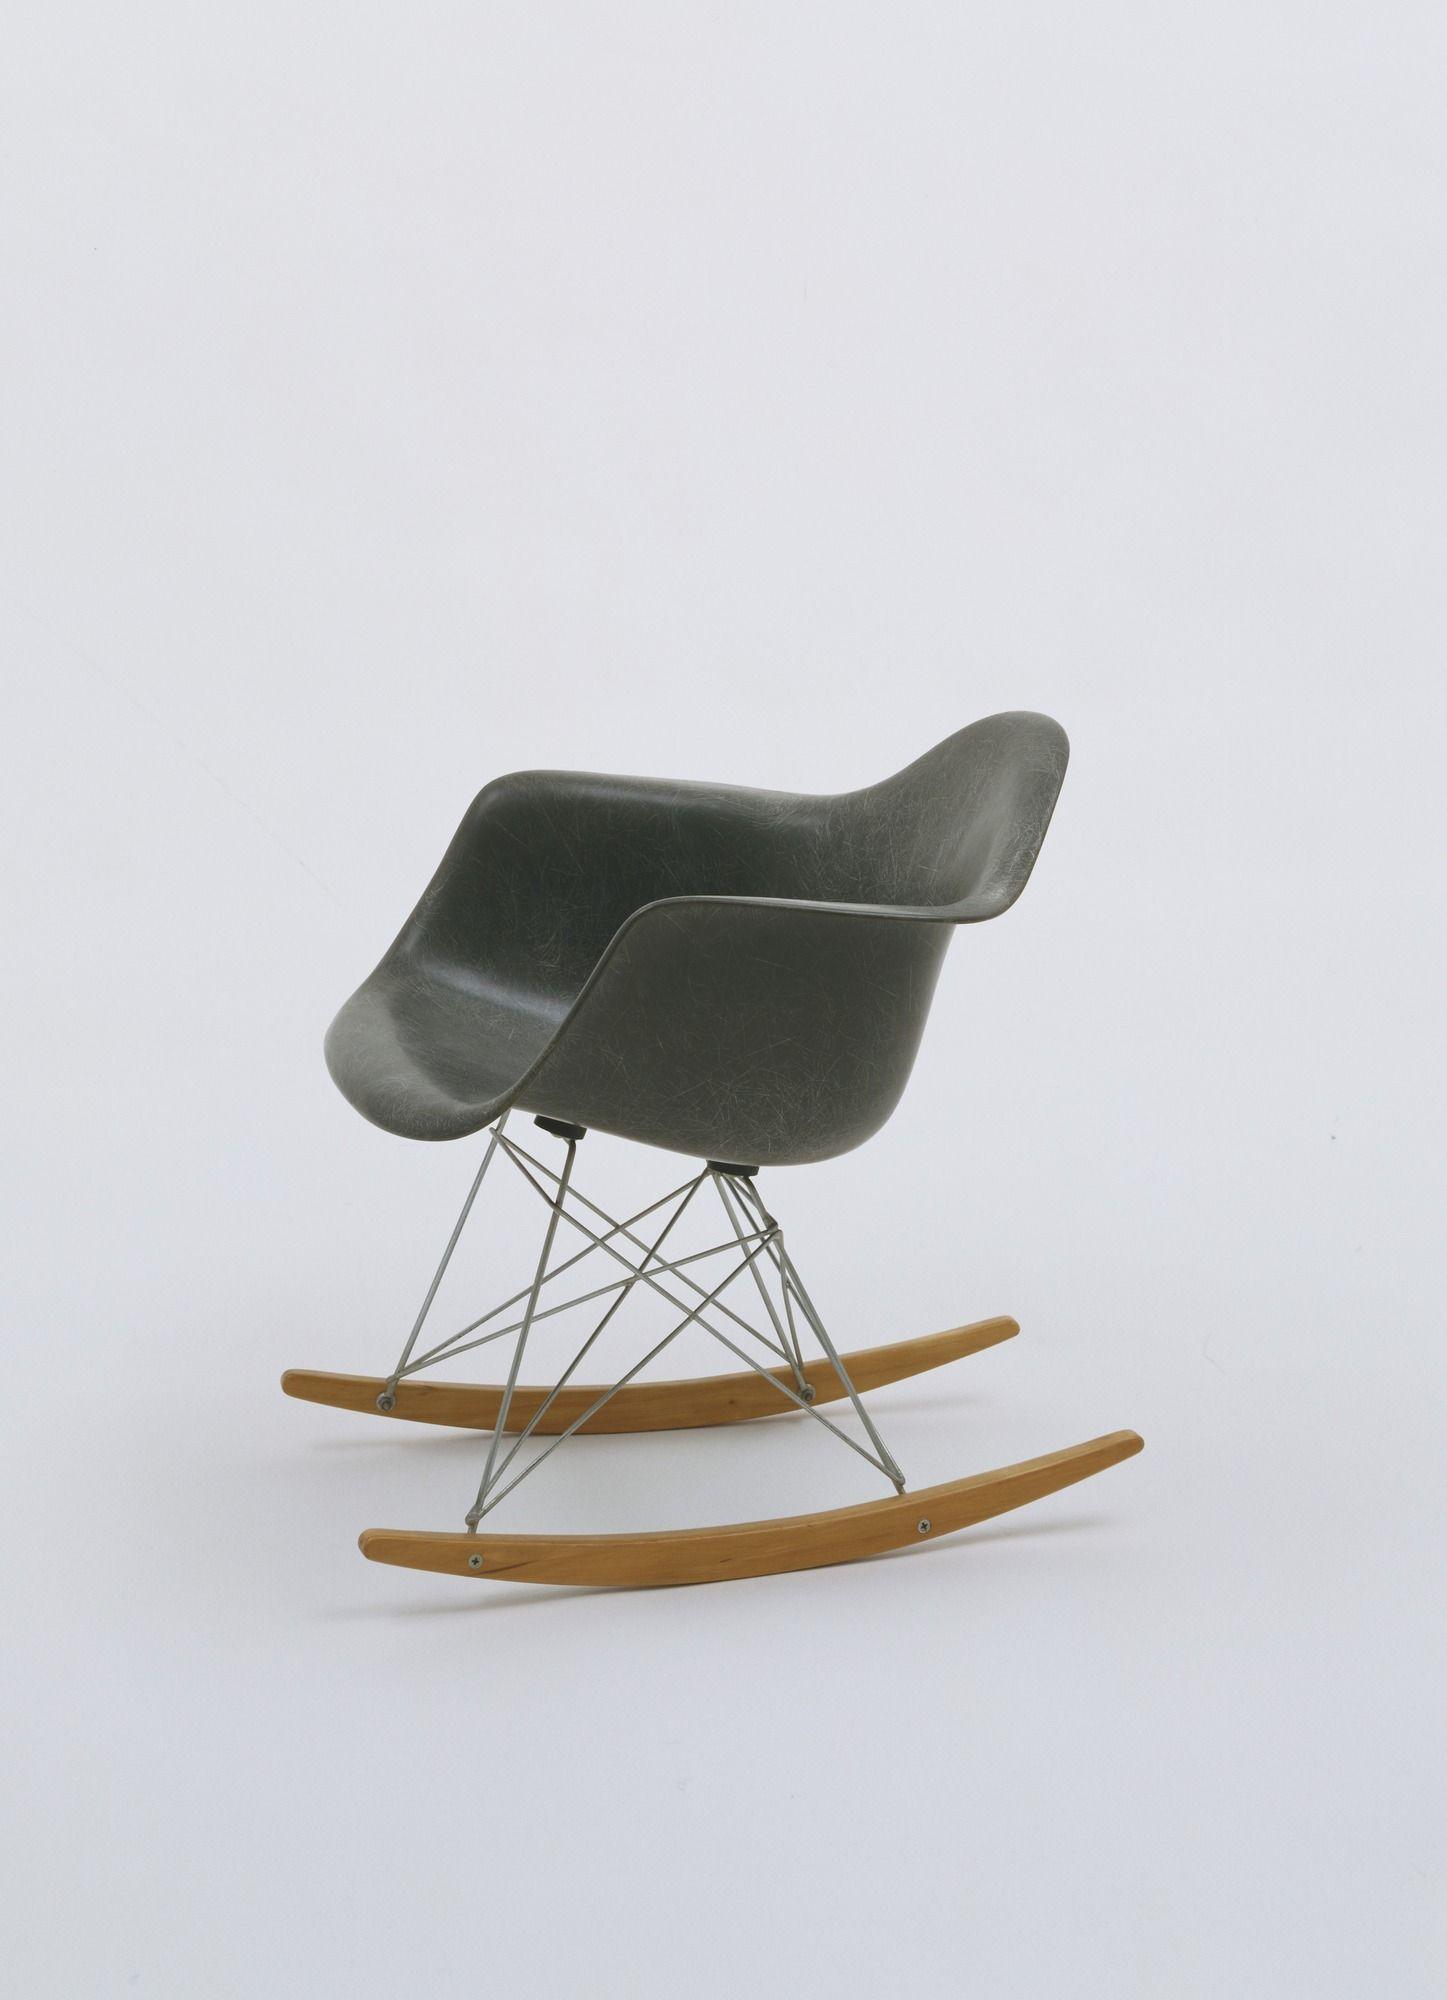 Charles Eames, Ray Eames. Rocking Armchair (model RAR